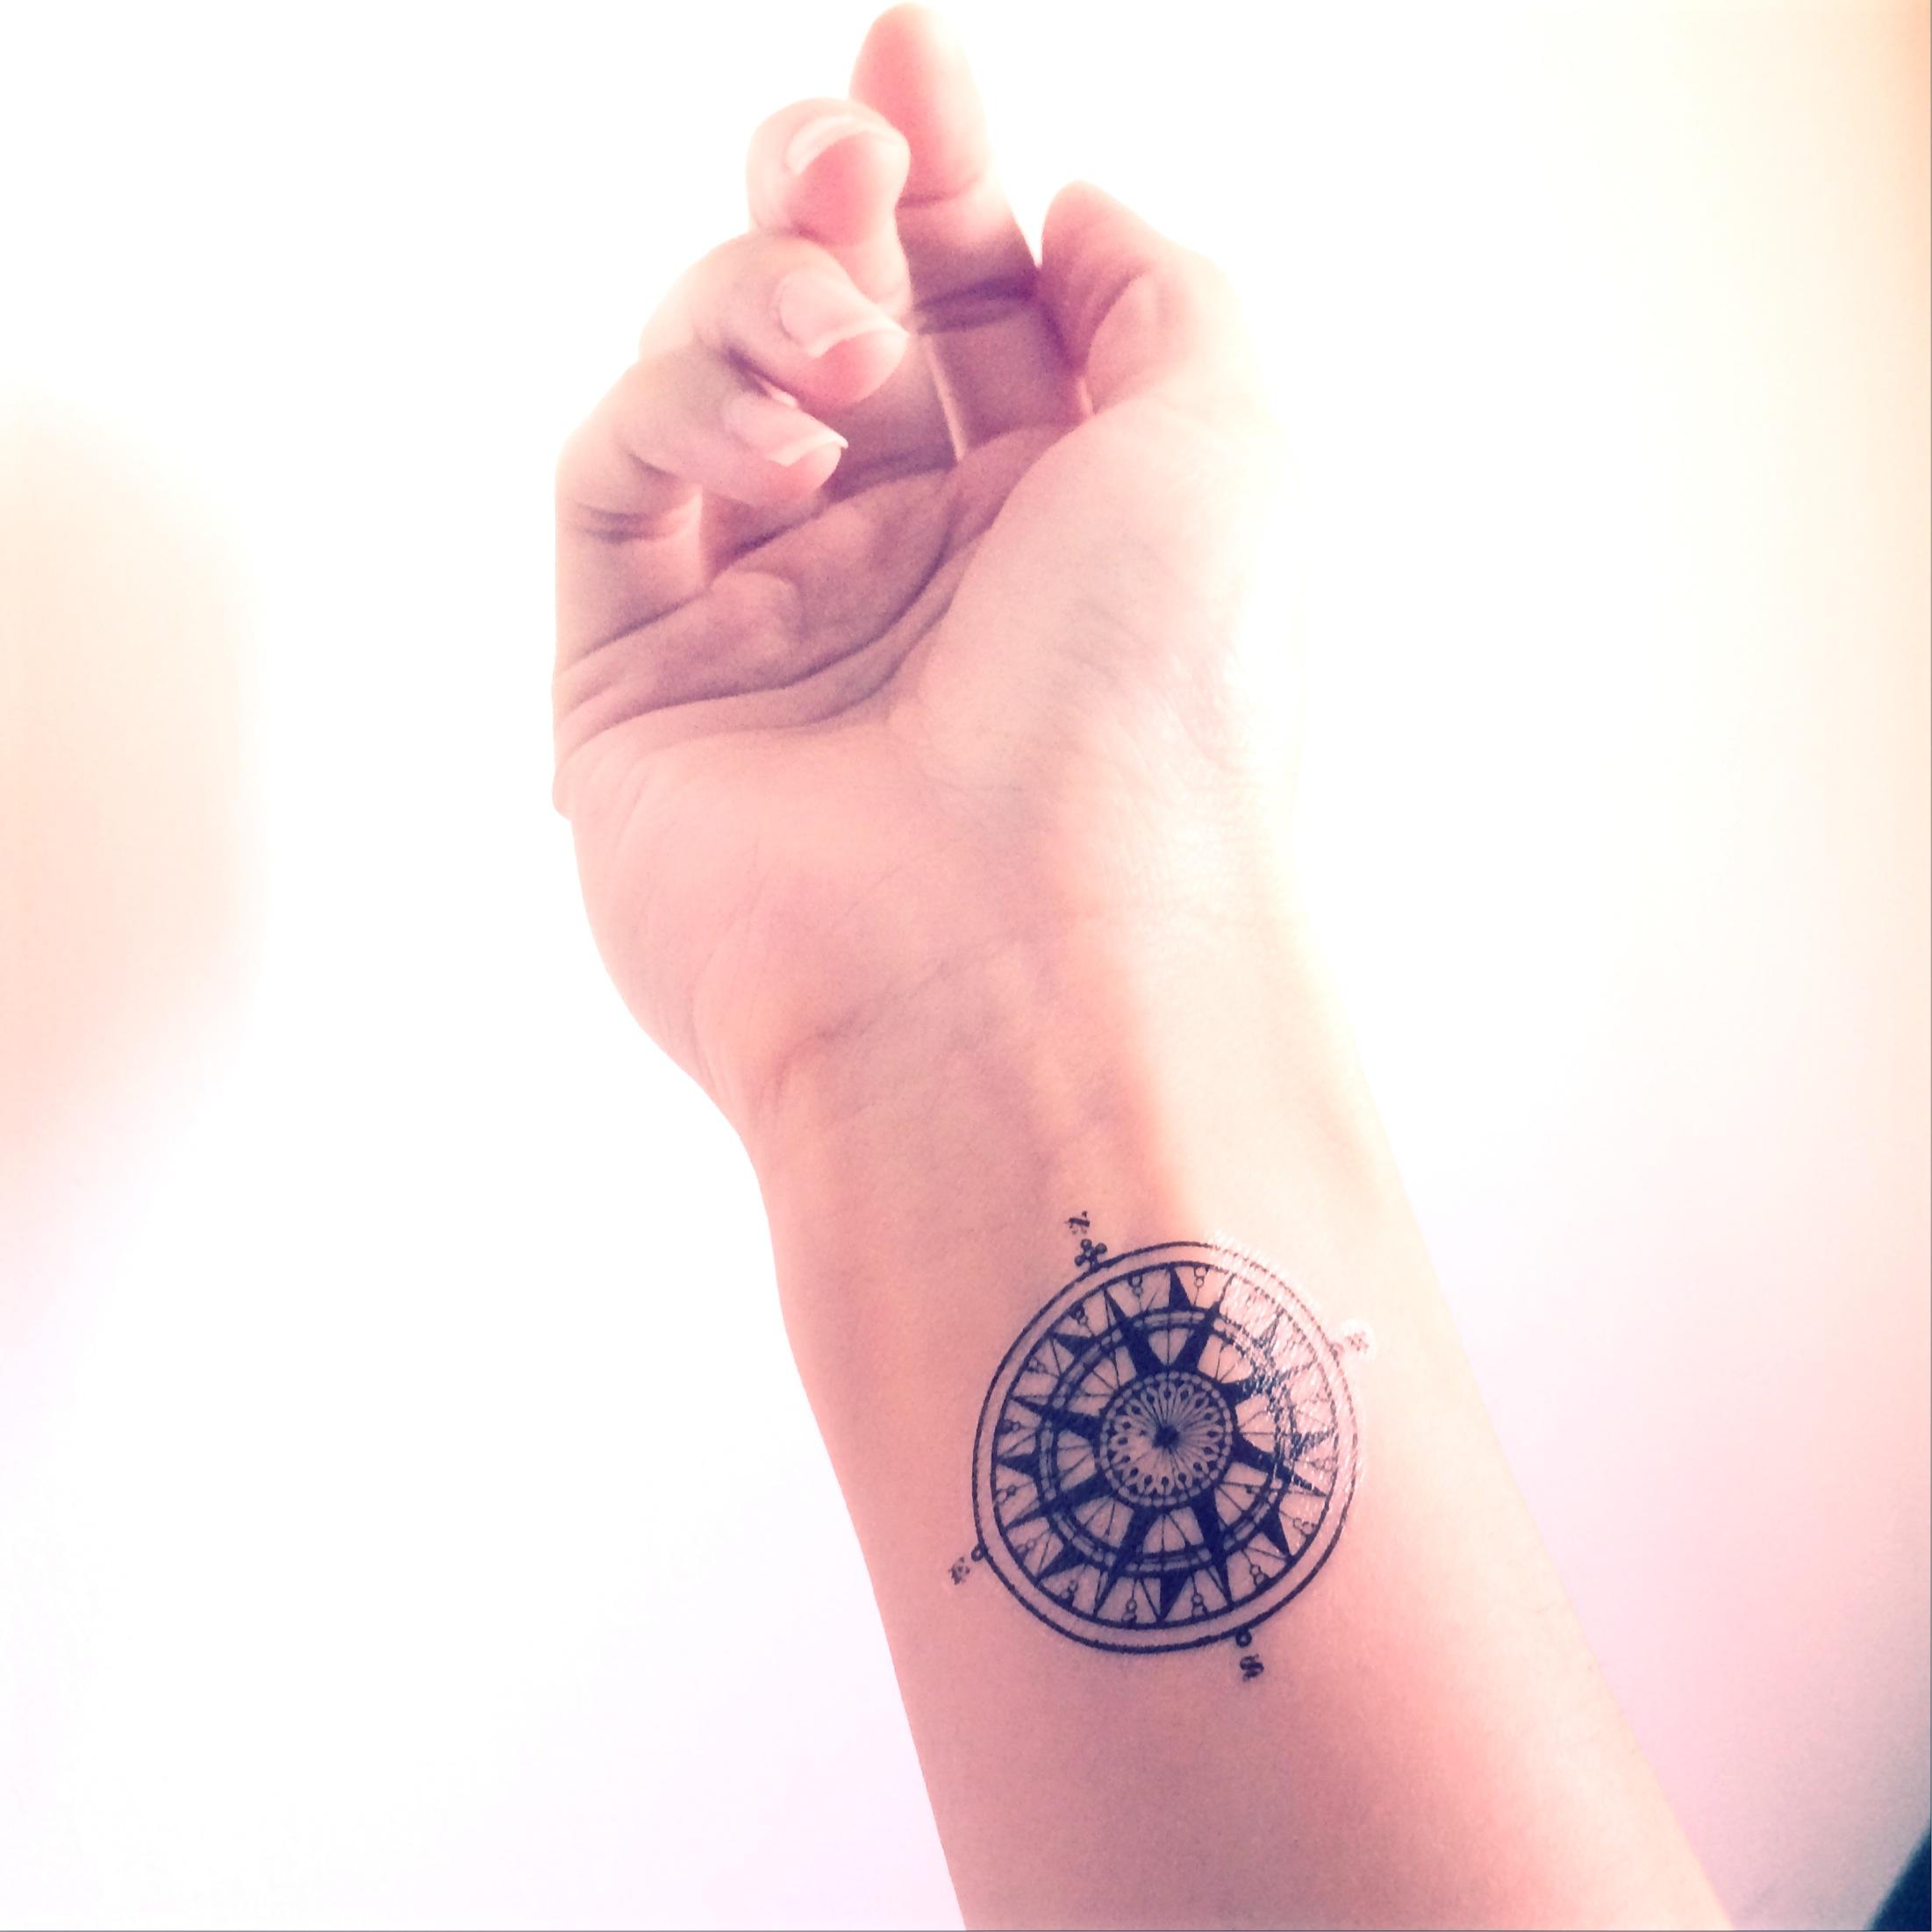 Tattoo Quotes Travel: 2pcs Vintage Compass Tattoo Travel